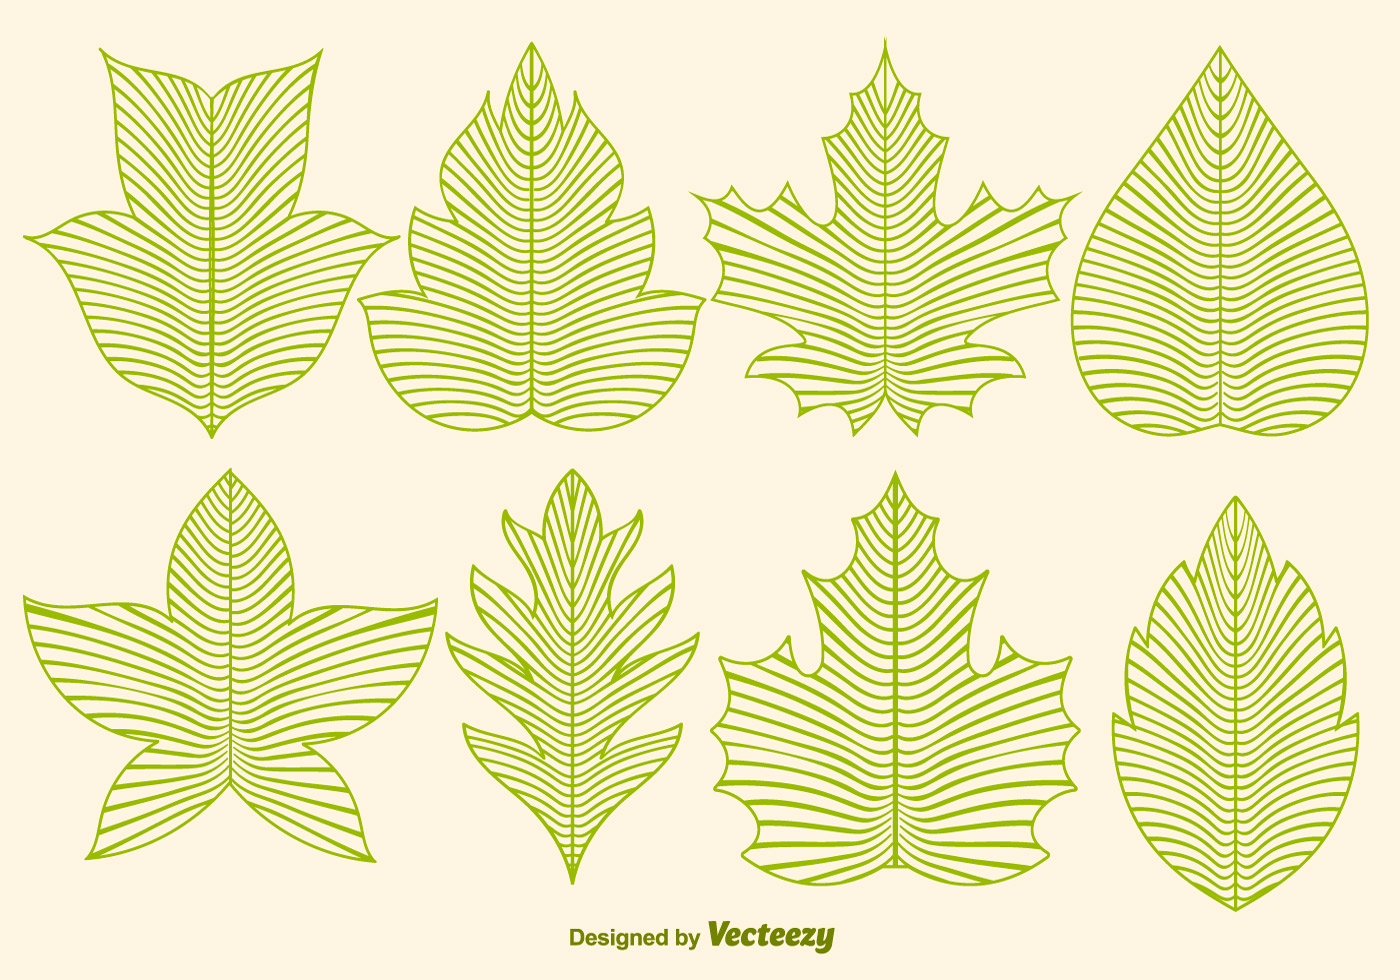 Line Art Leaf : Vector leaf icons in line style download free art